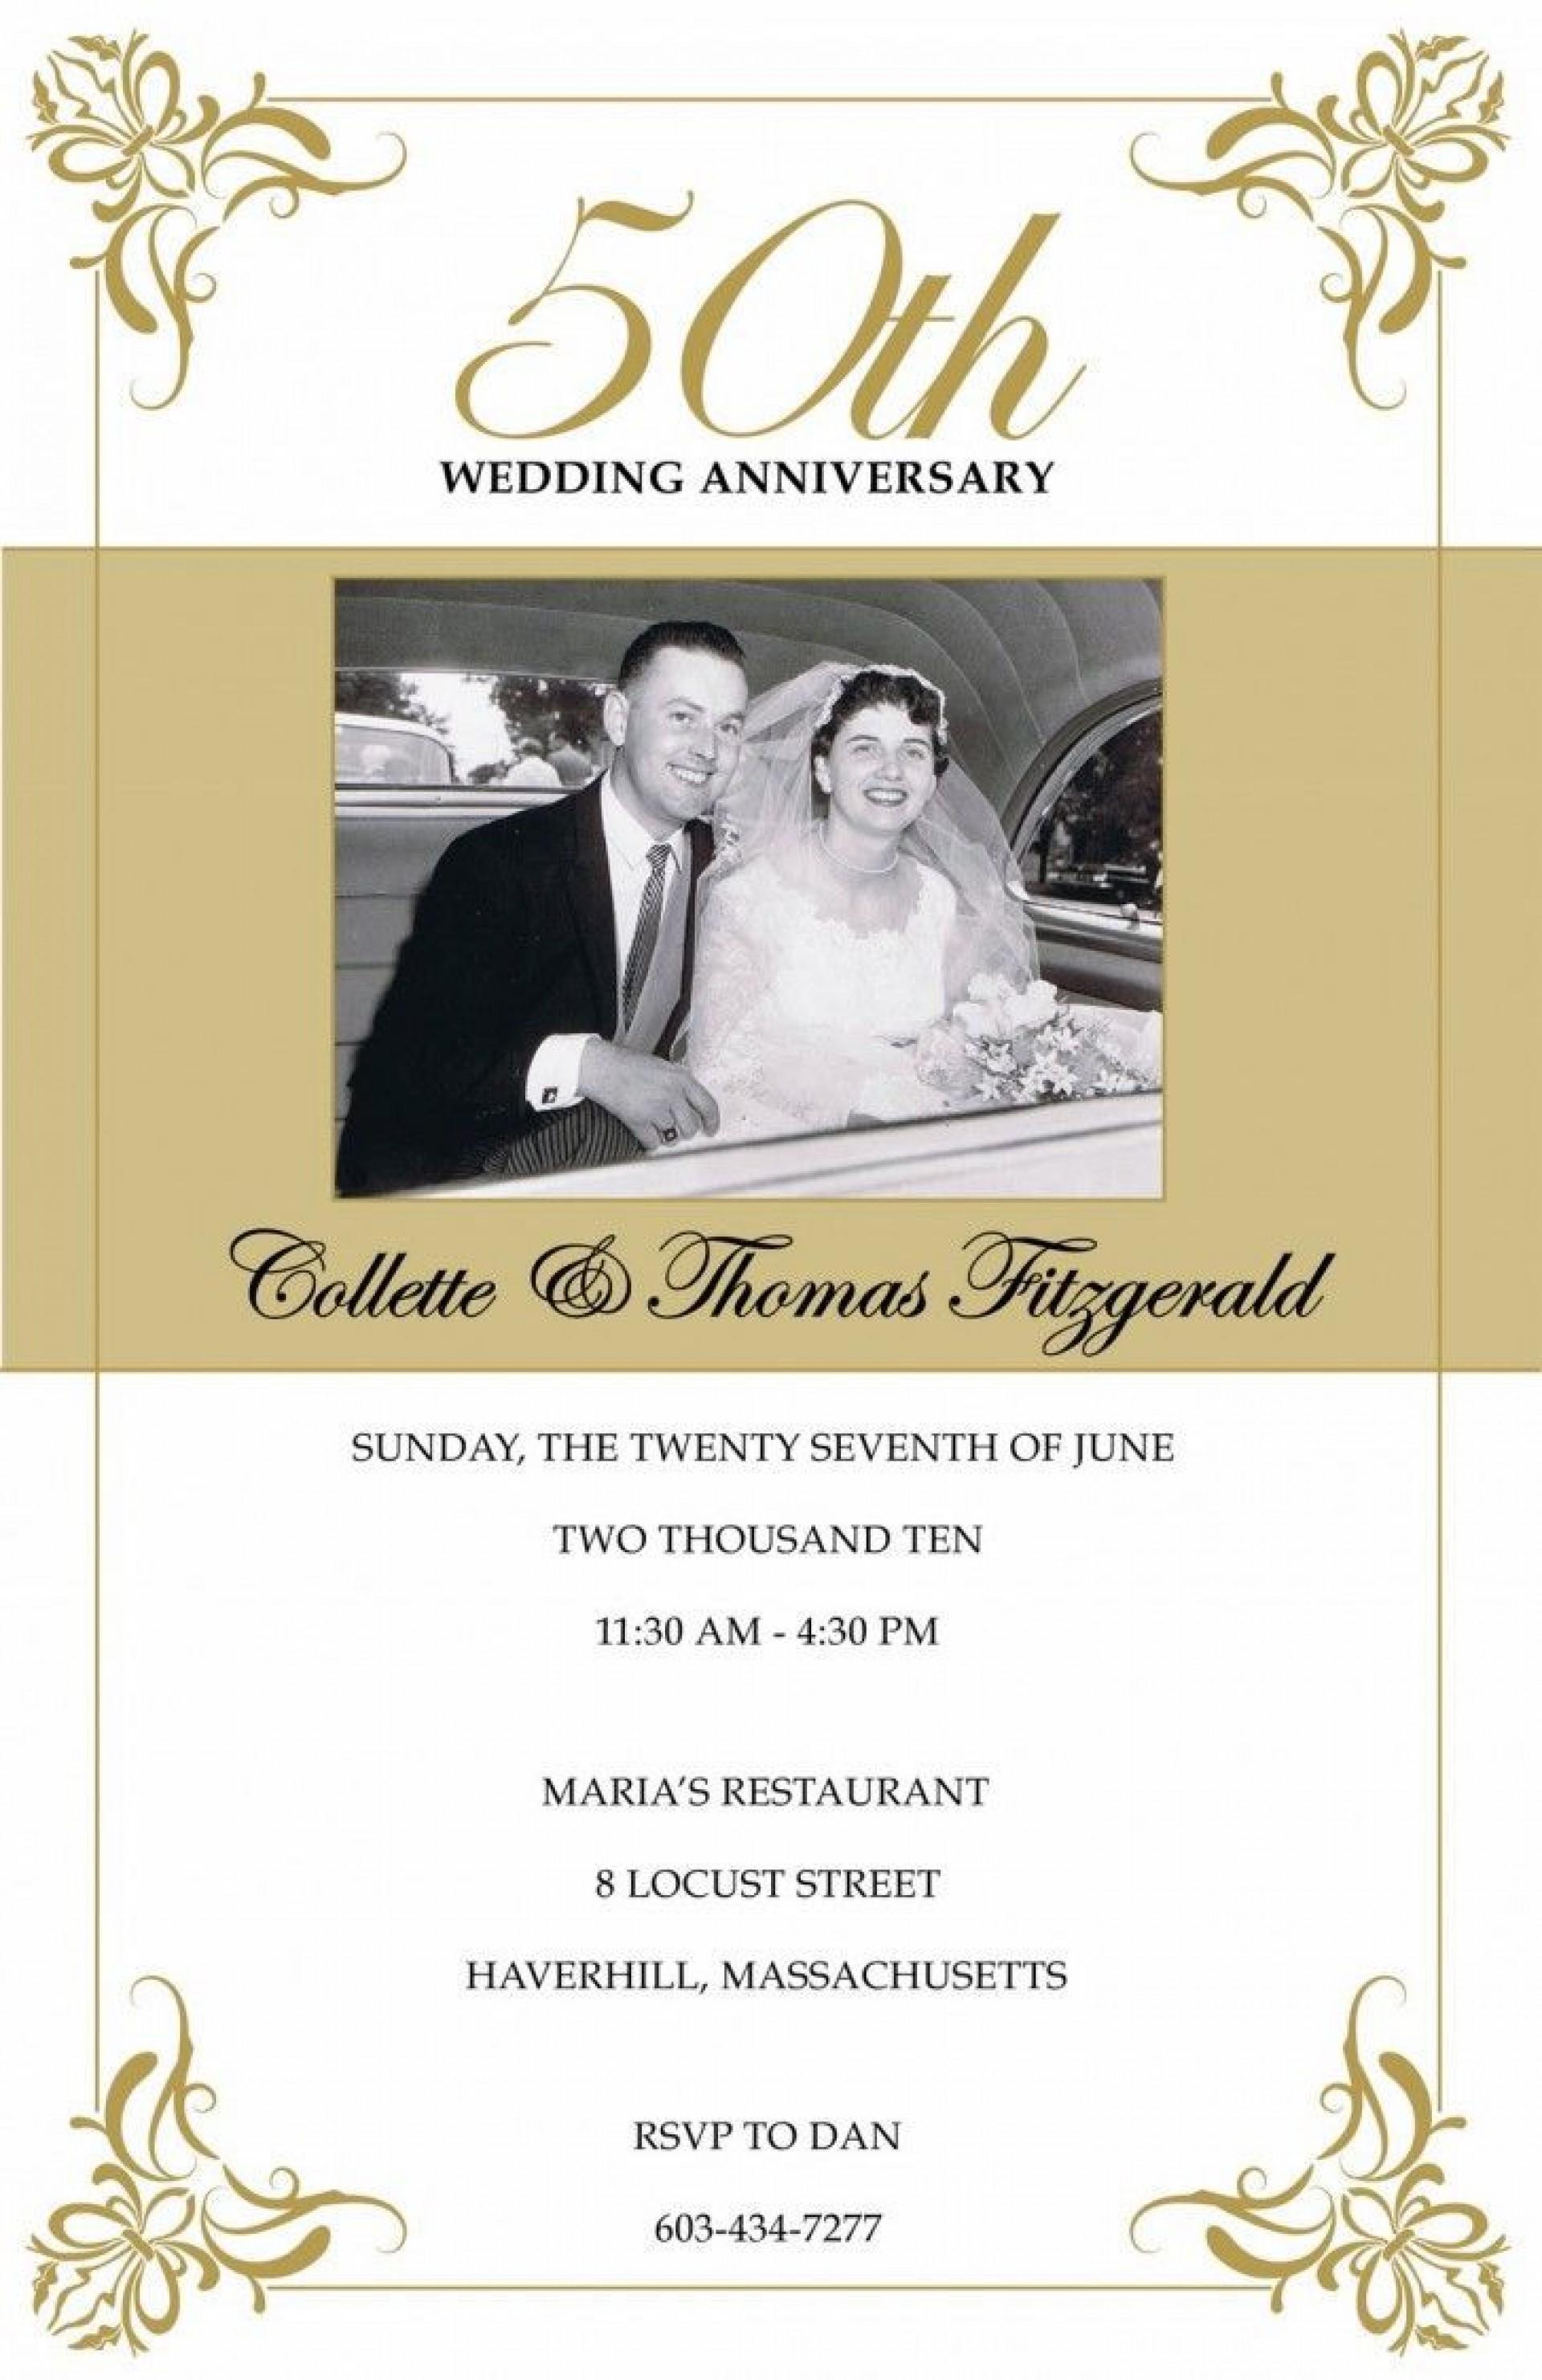 008 Magnificent 50th Wedding Anniversary Invitation Template Free Design  Download Golden Microsoft Word1920